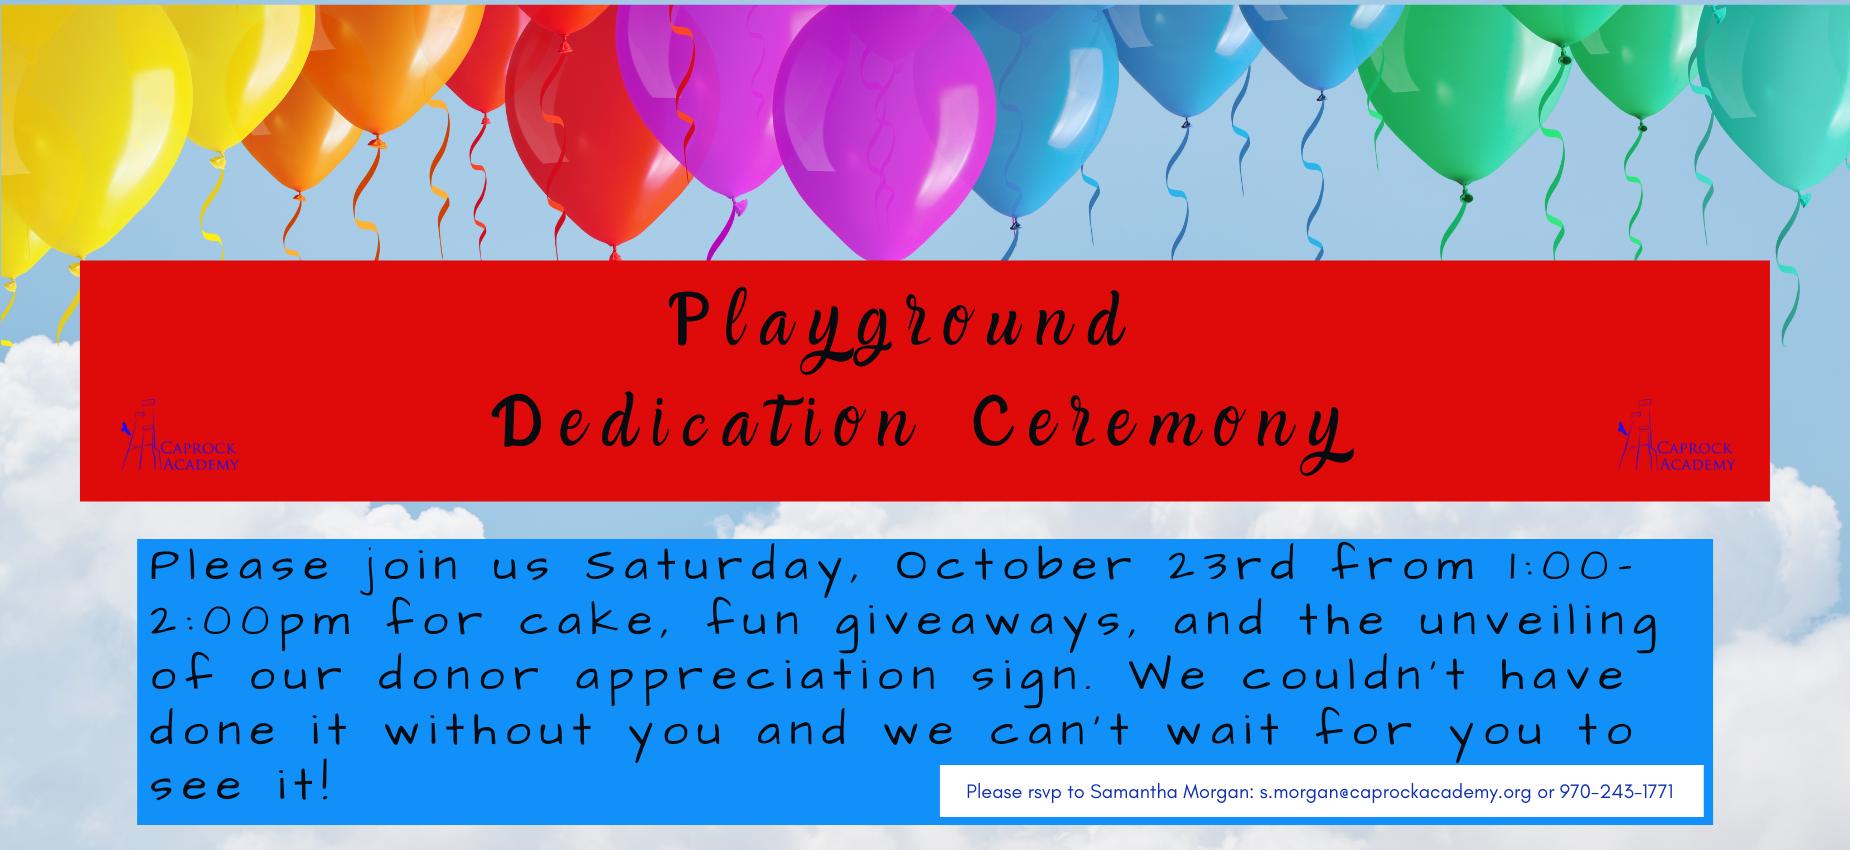 Playground Dedication Ceremony Oct 23rd